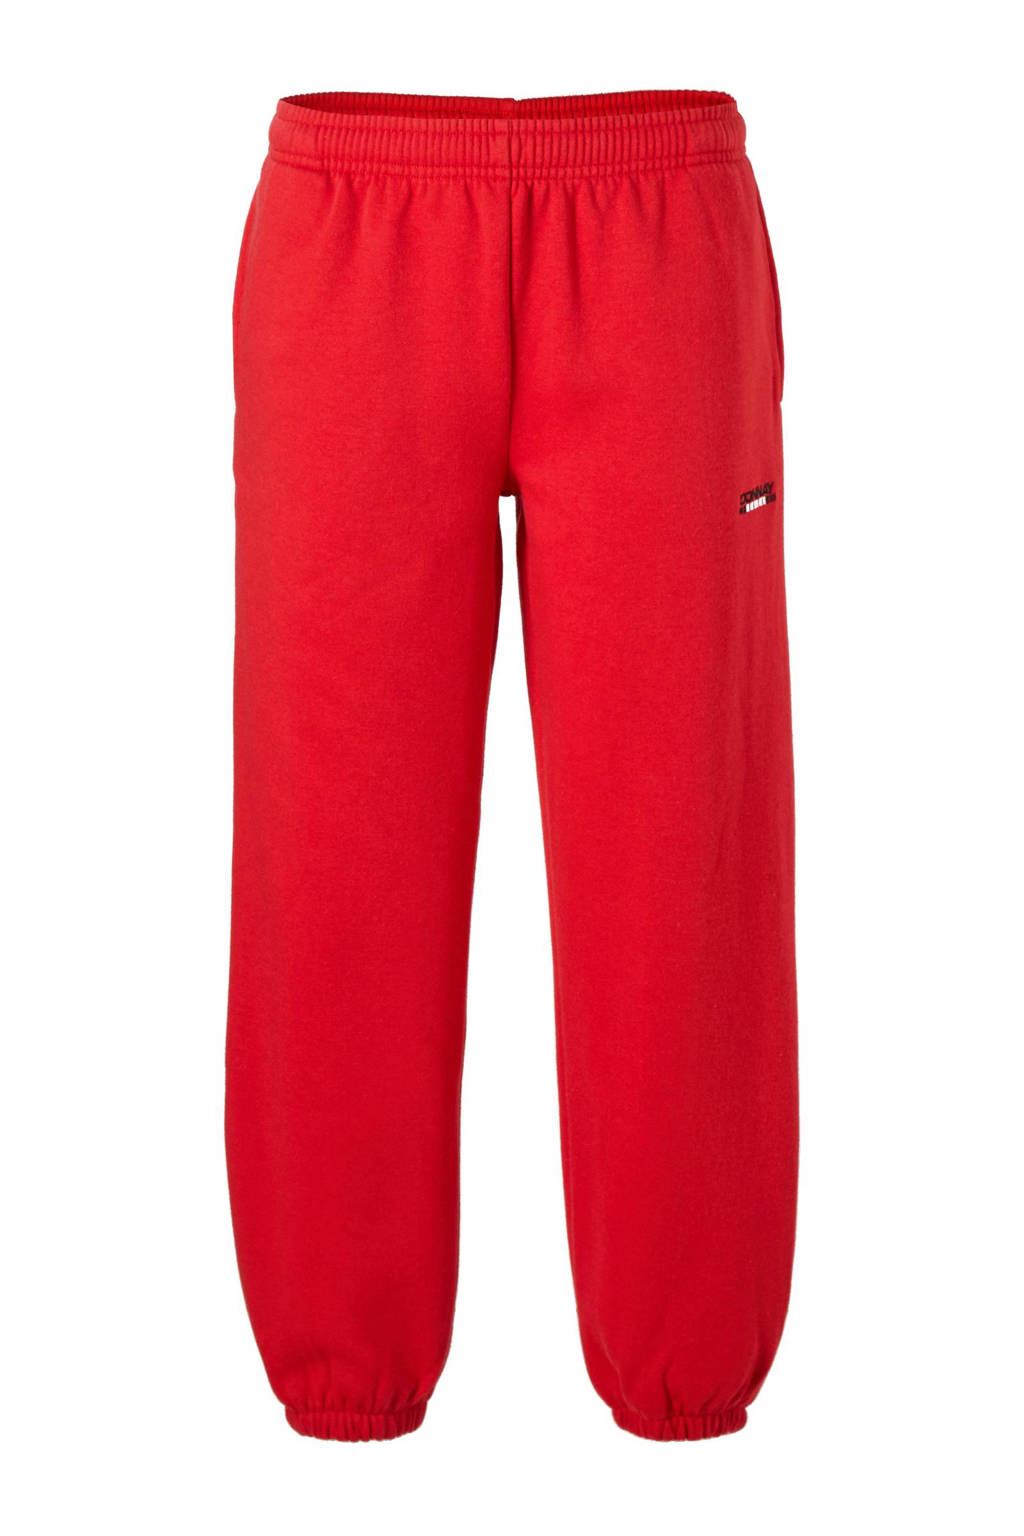 Donnay   joggingbroek rood, Joggingbroek Rood